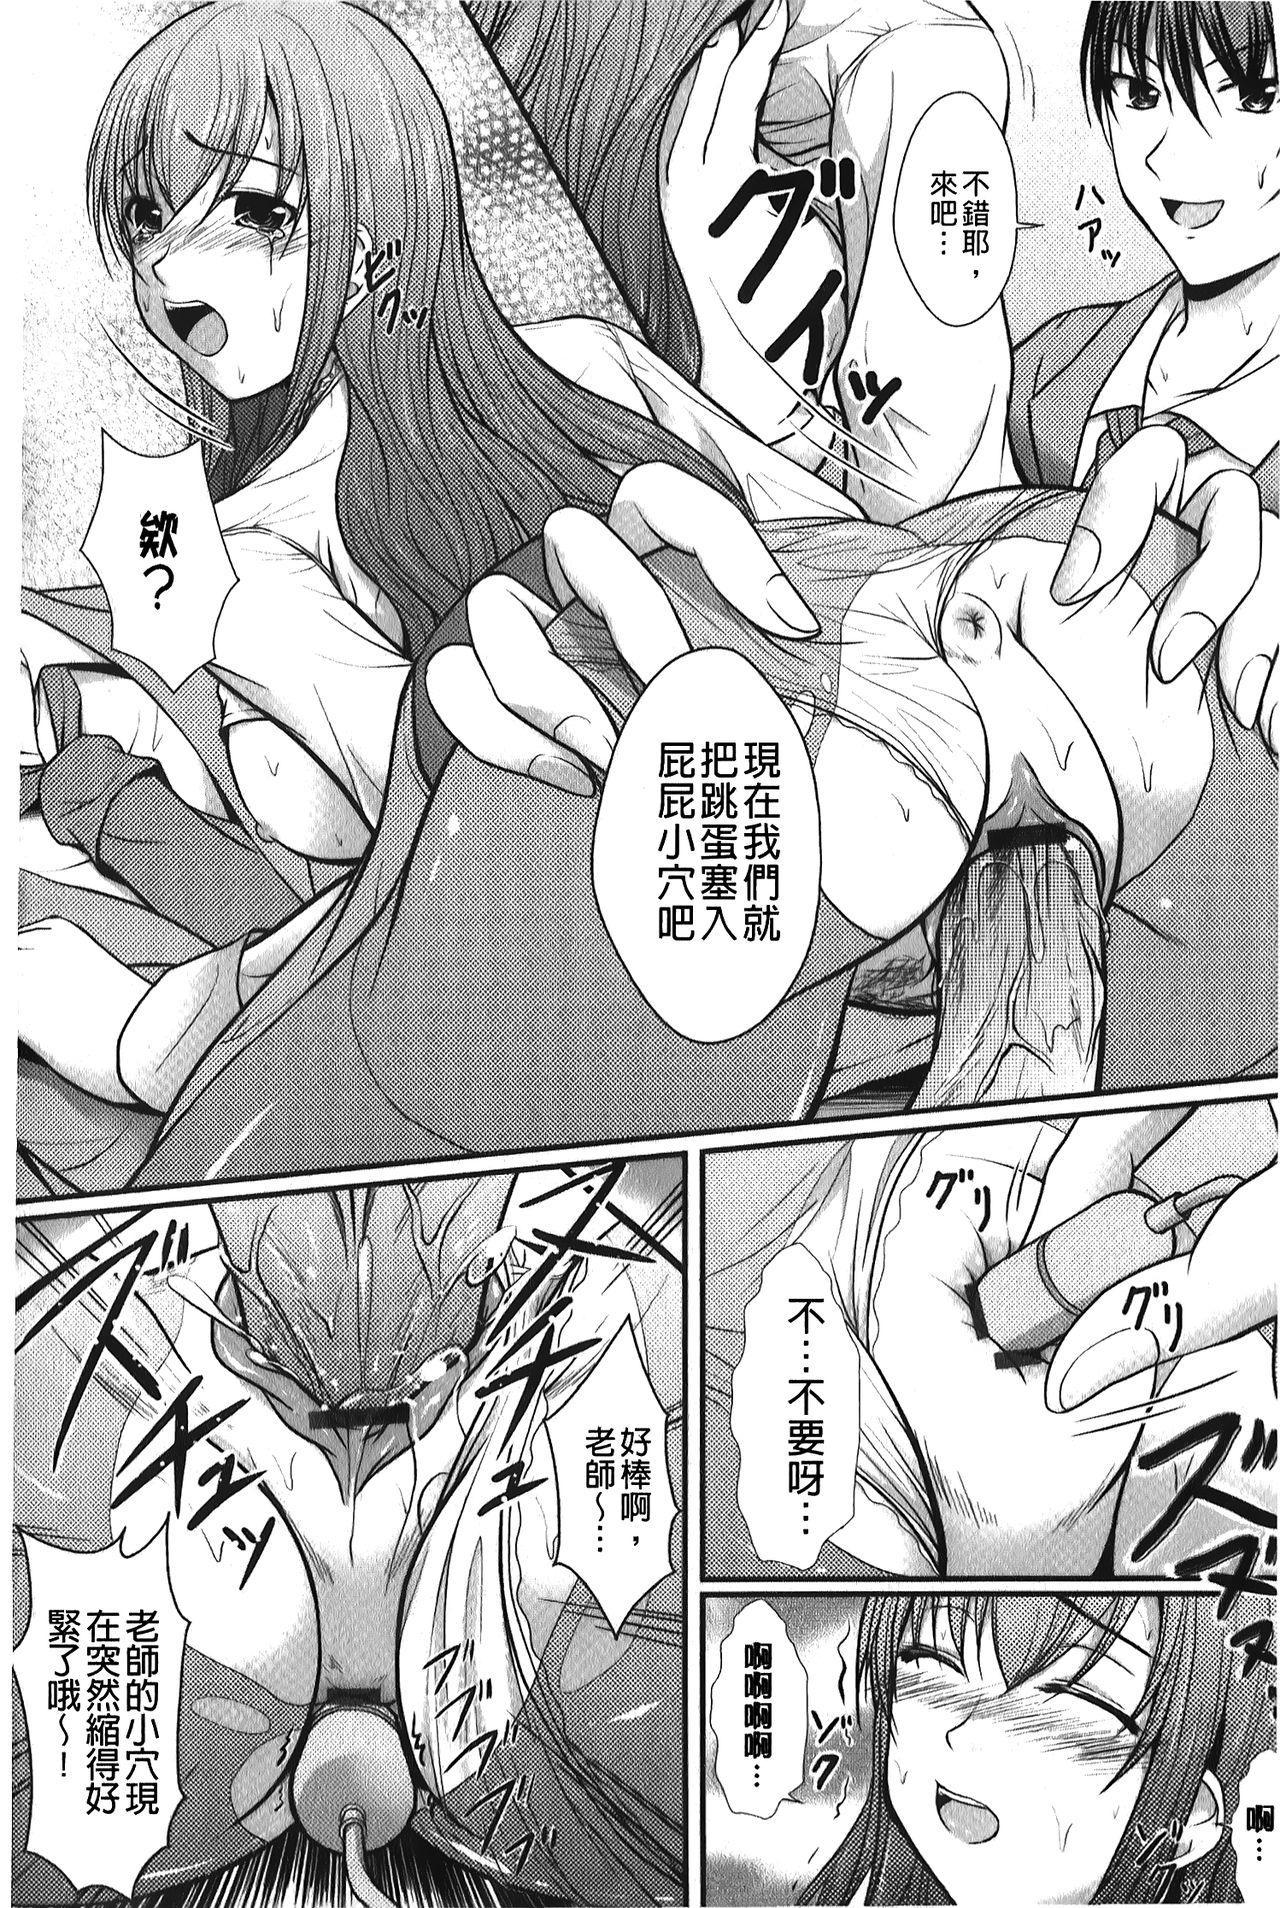 Hameochi | 戳插墮落 156